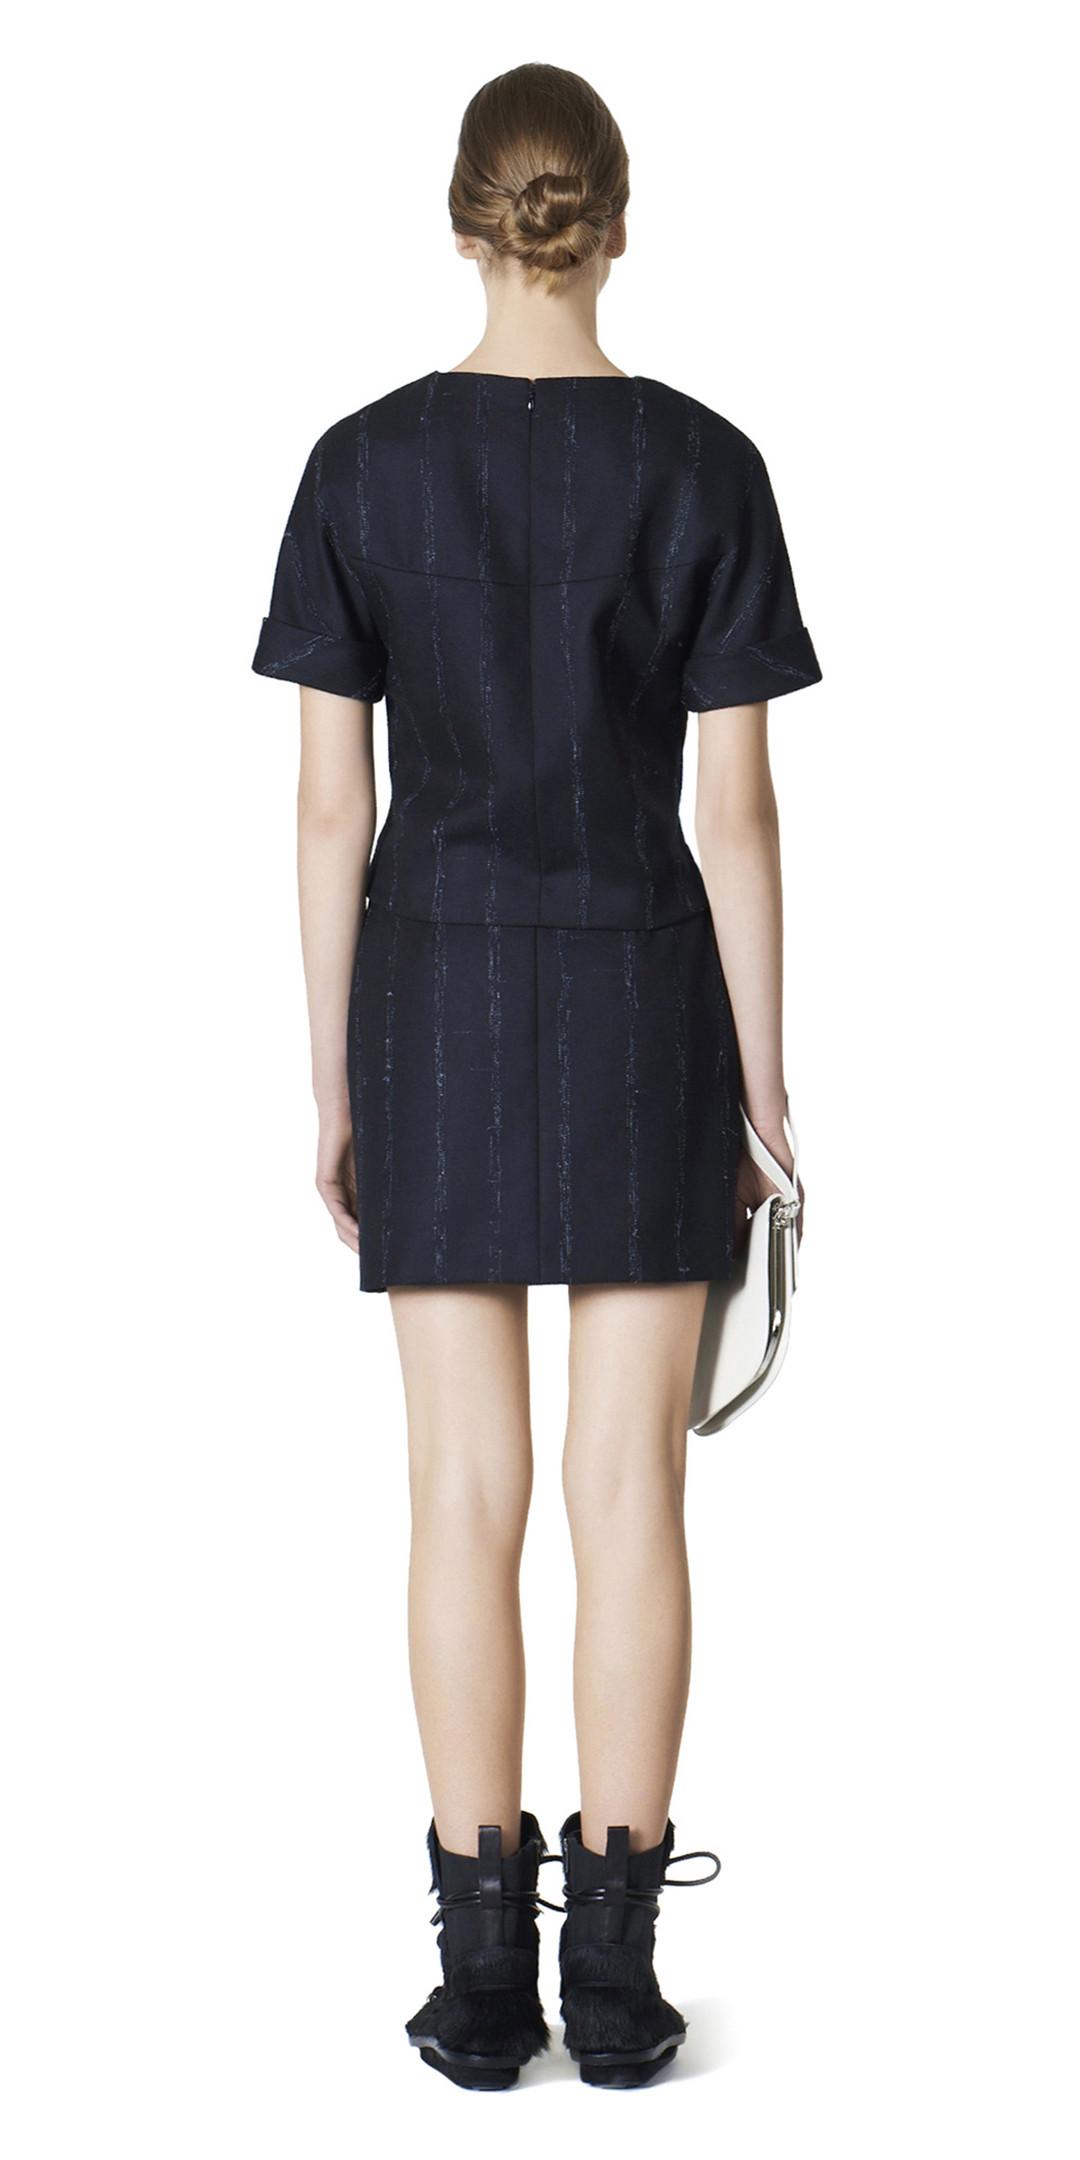 BALENCIAGA Skirt D Balenciaga Edition Stripes Mini Skirt i